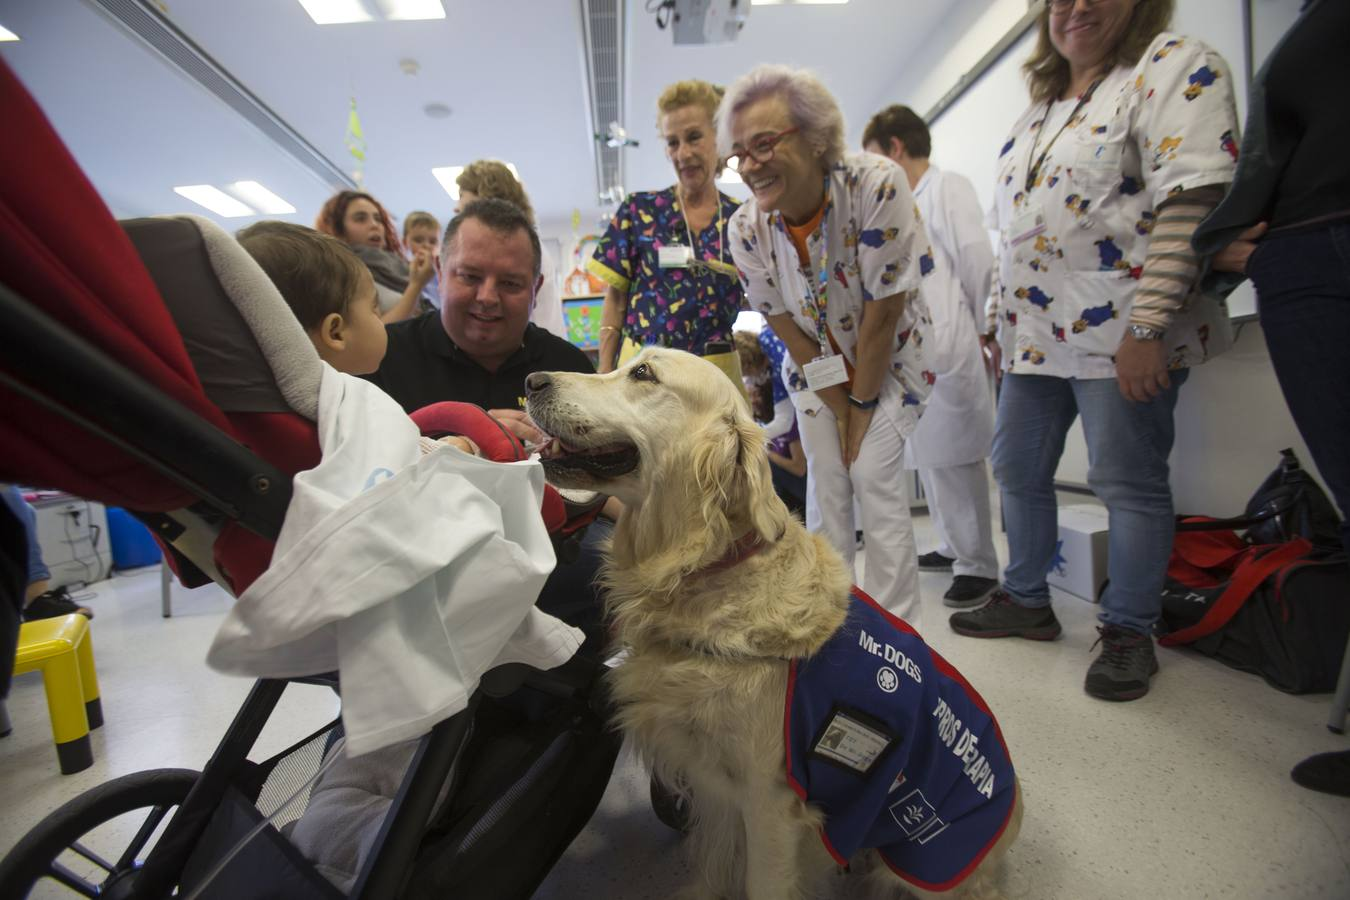 Proyecto Dr.Guau Mr.Dogs Terapia con perros Hospital Santa Lucia